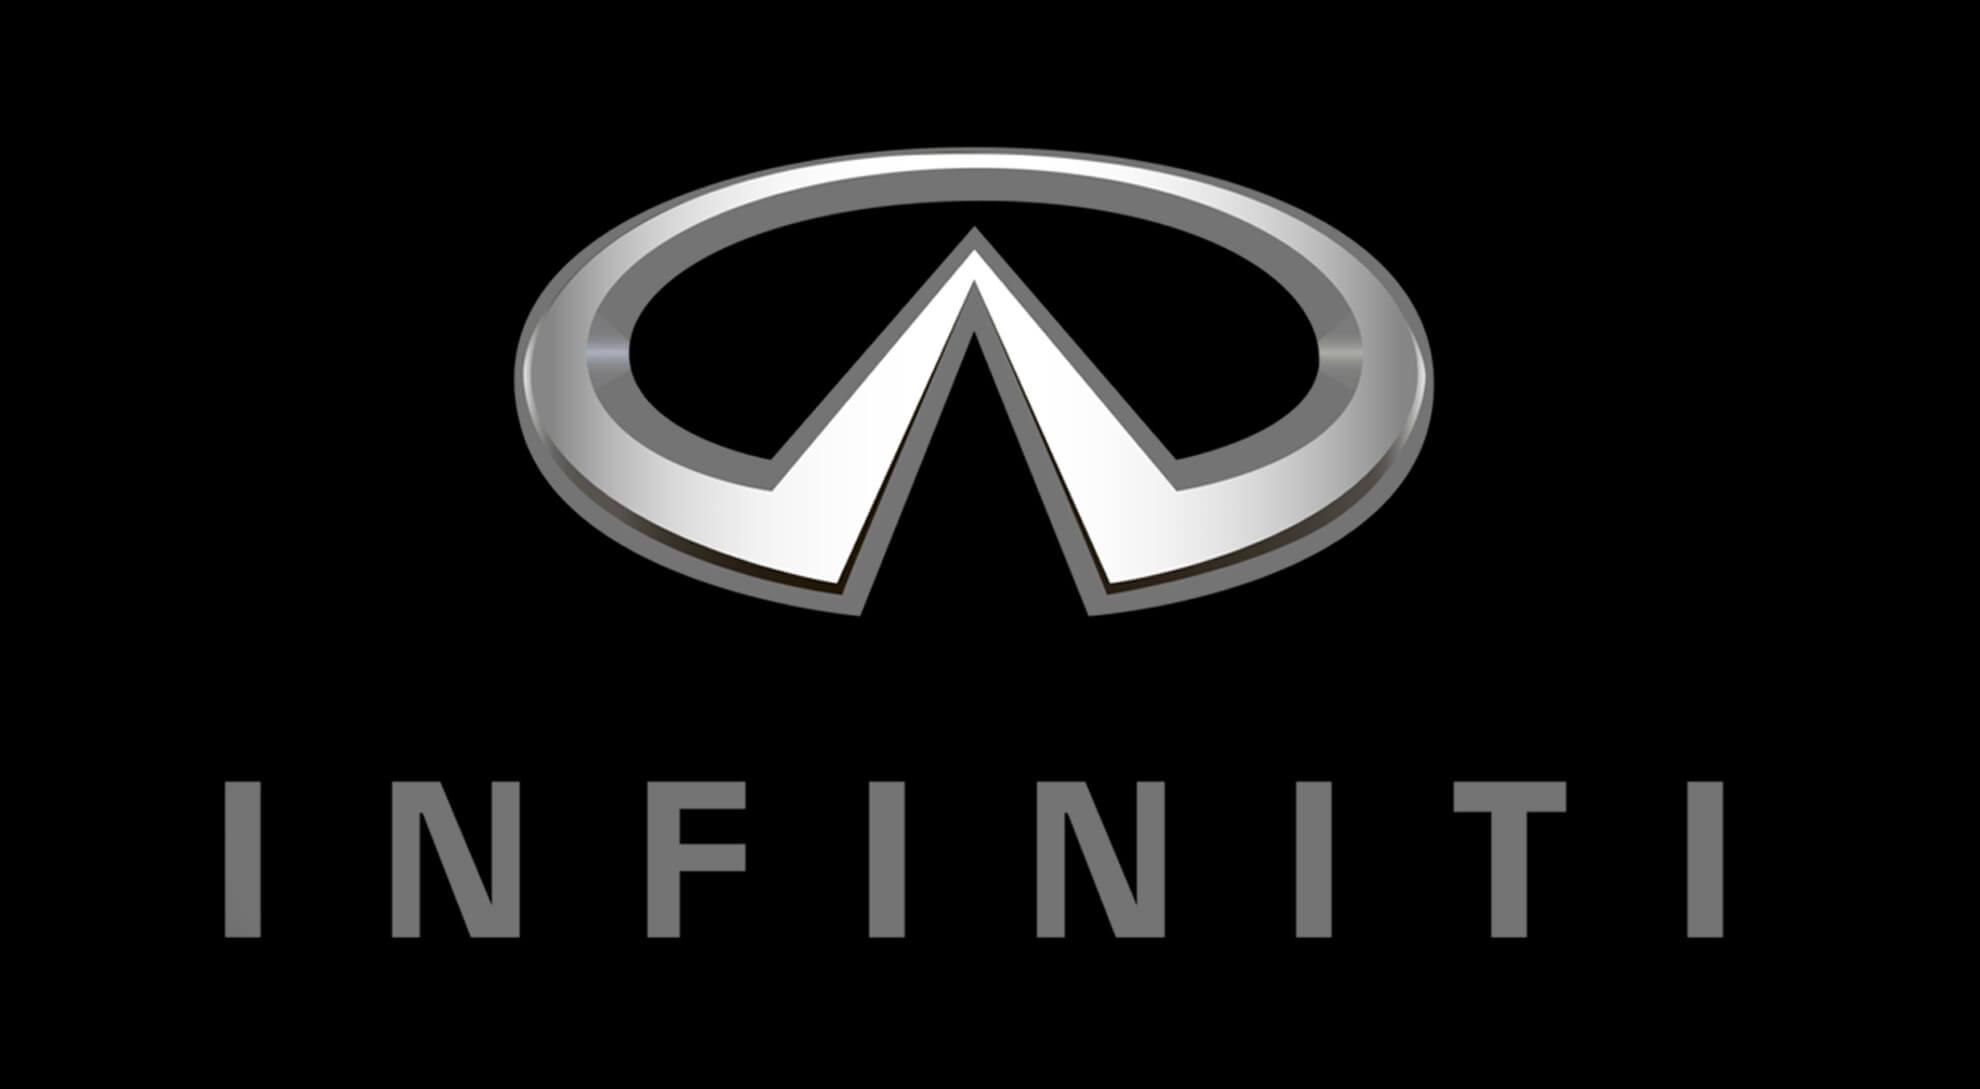 ustanovka-android-infiniti